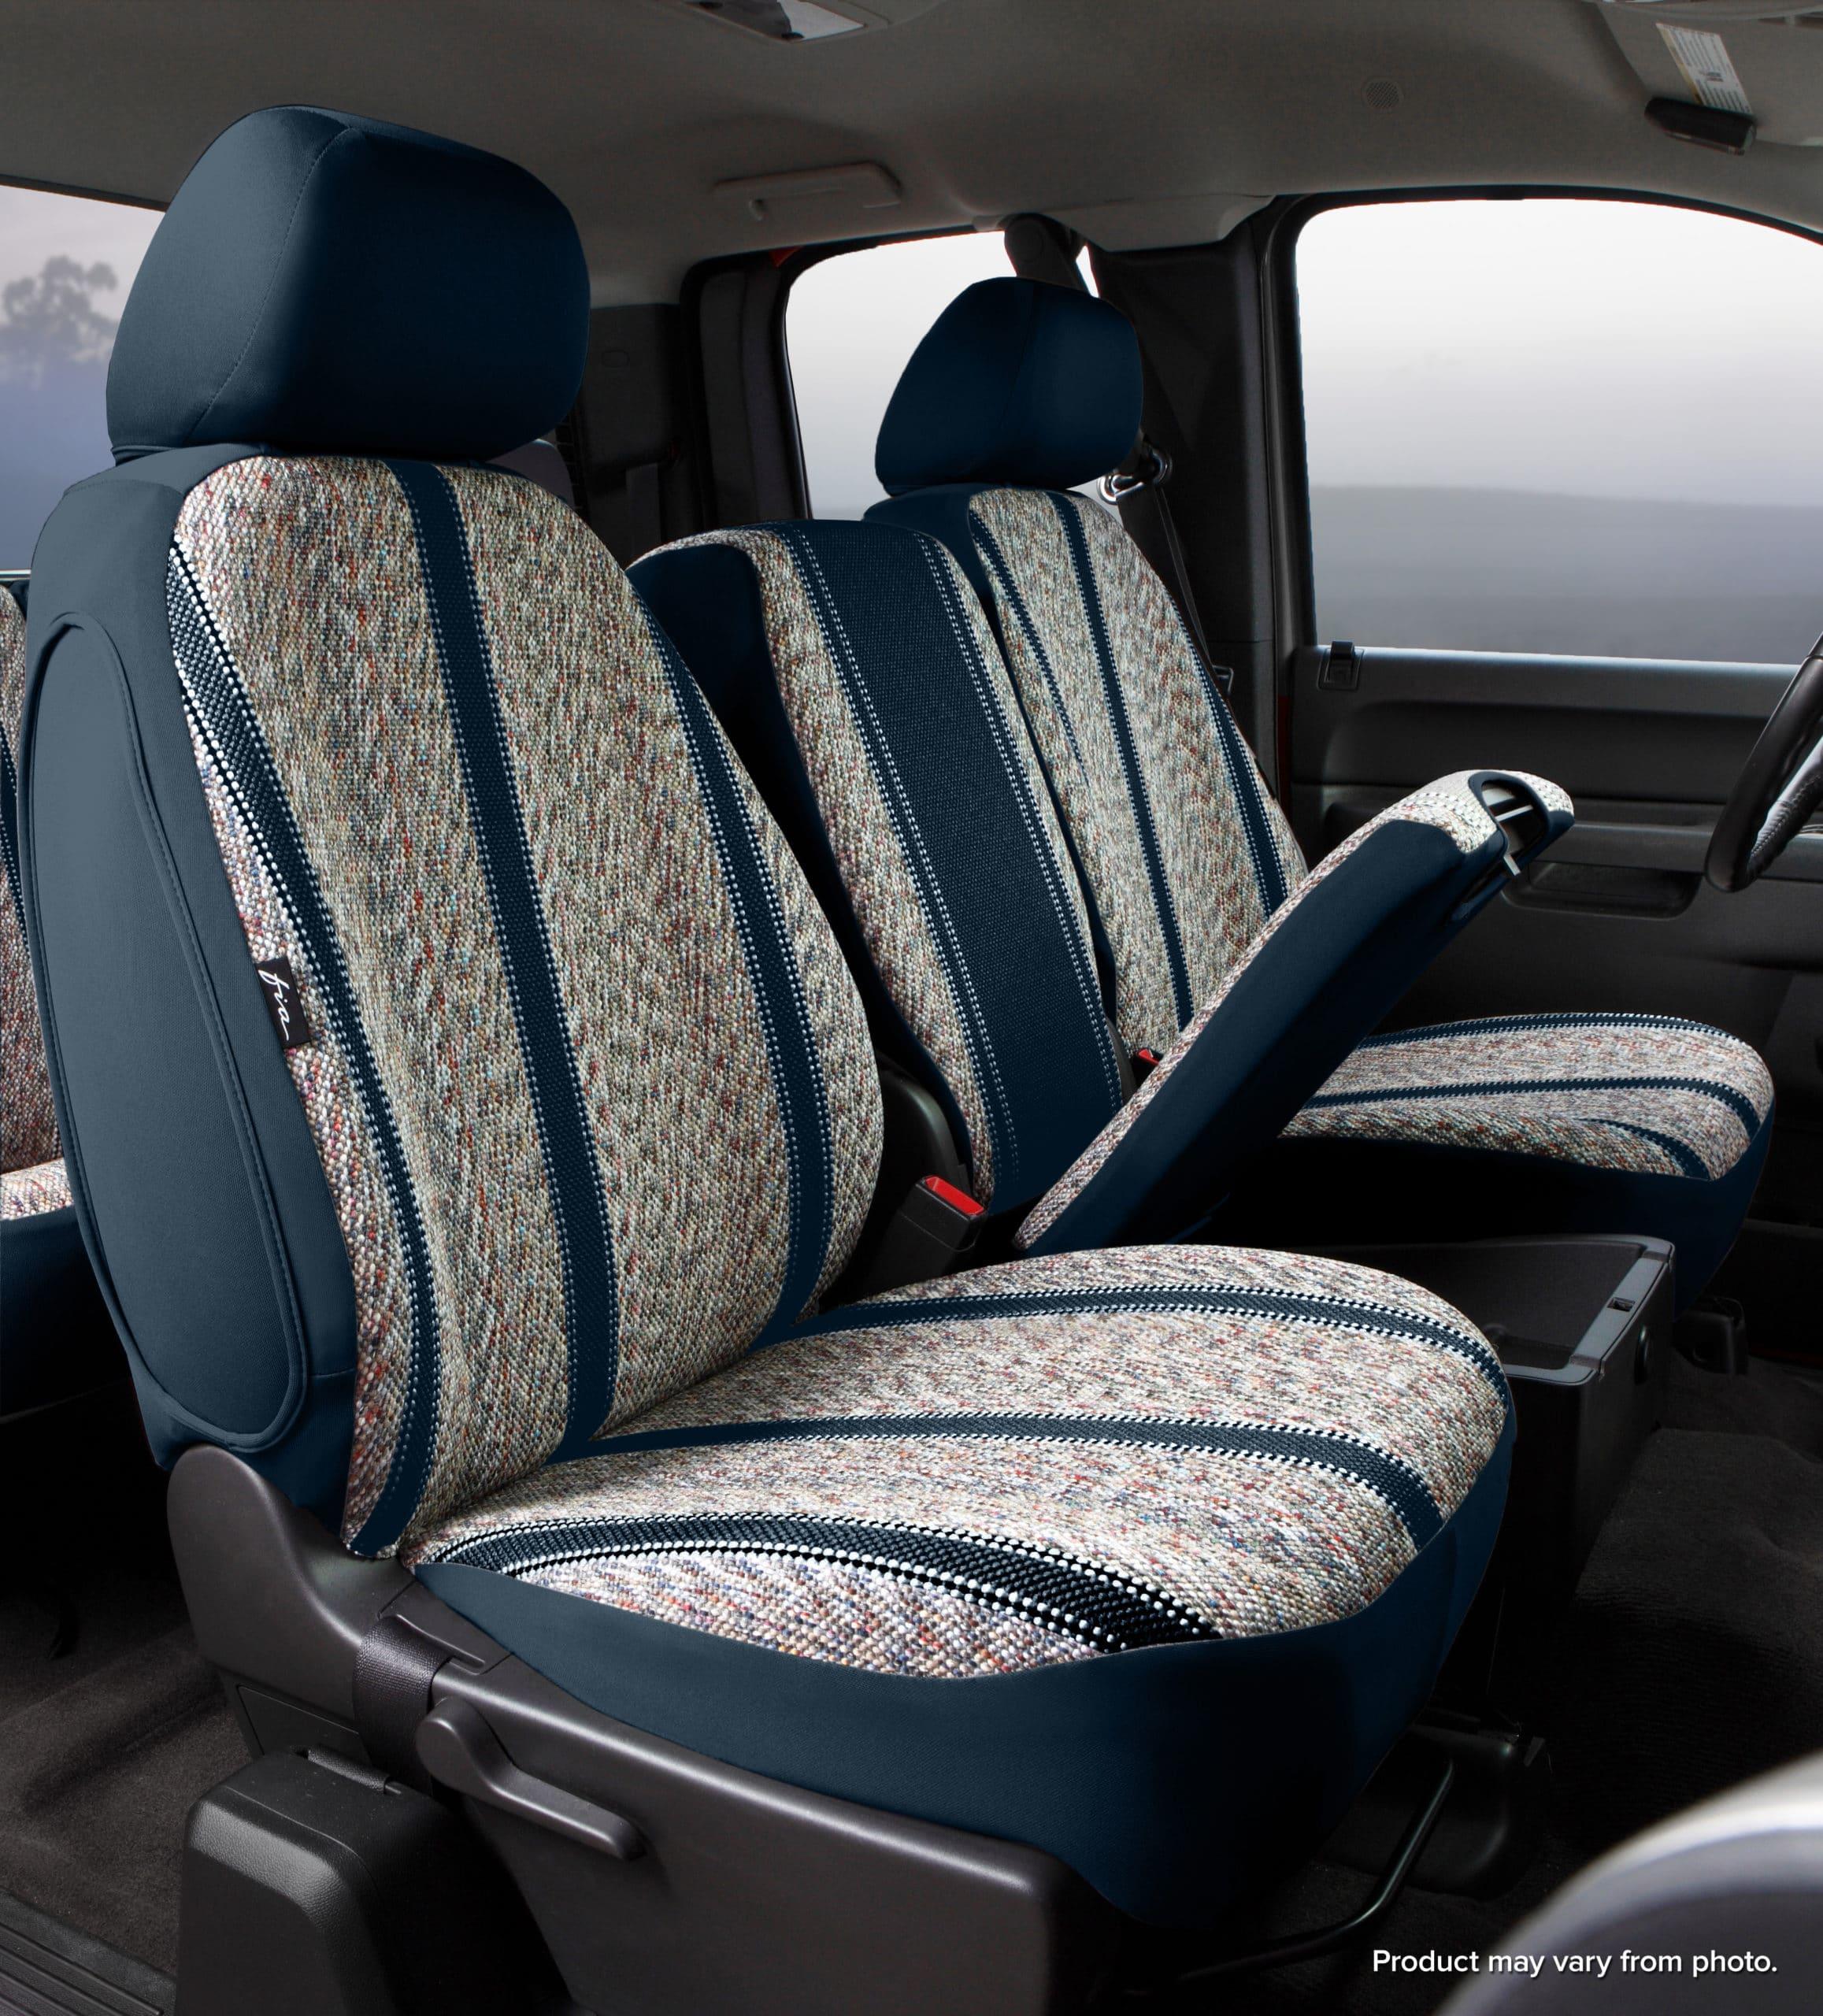 Fia Original Wrangler Seat Covers - Navy - Front Seats